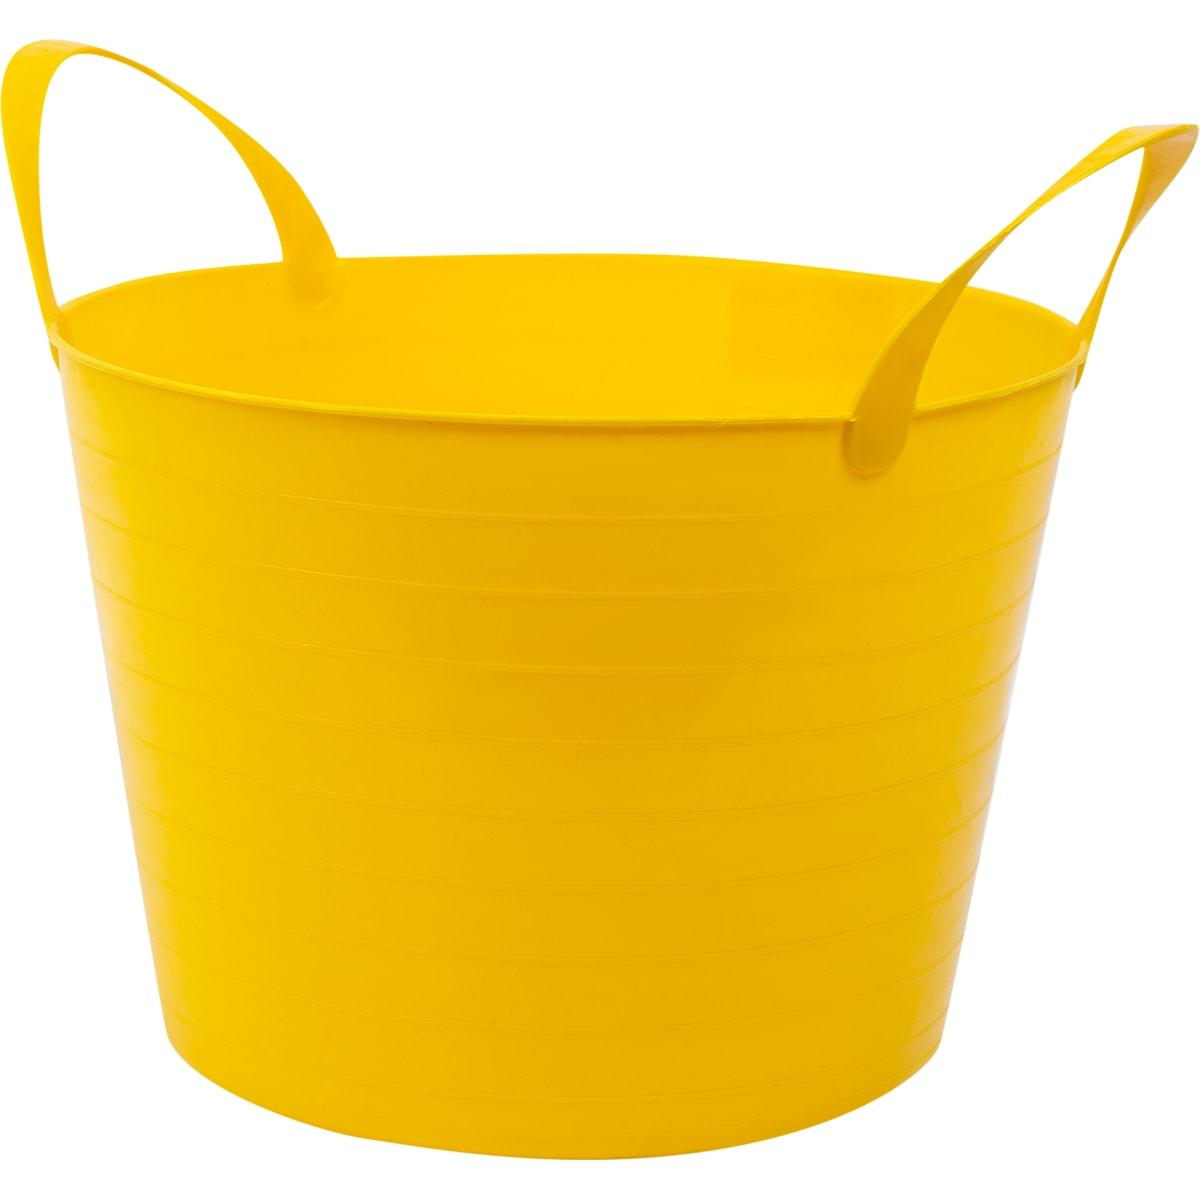 Ведро с ручками гибкое жёлтое 14 л, мягкий пластик